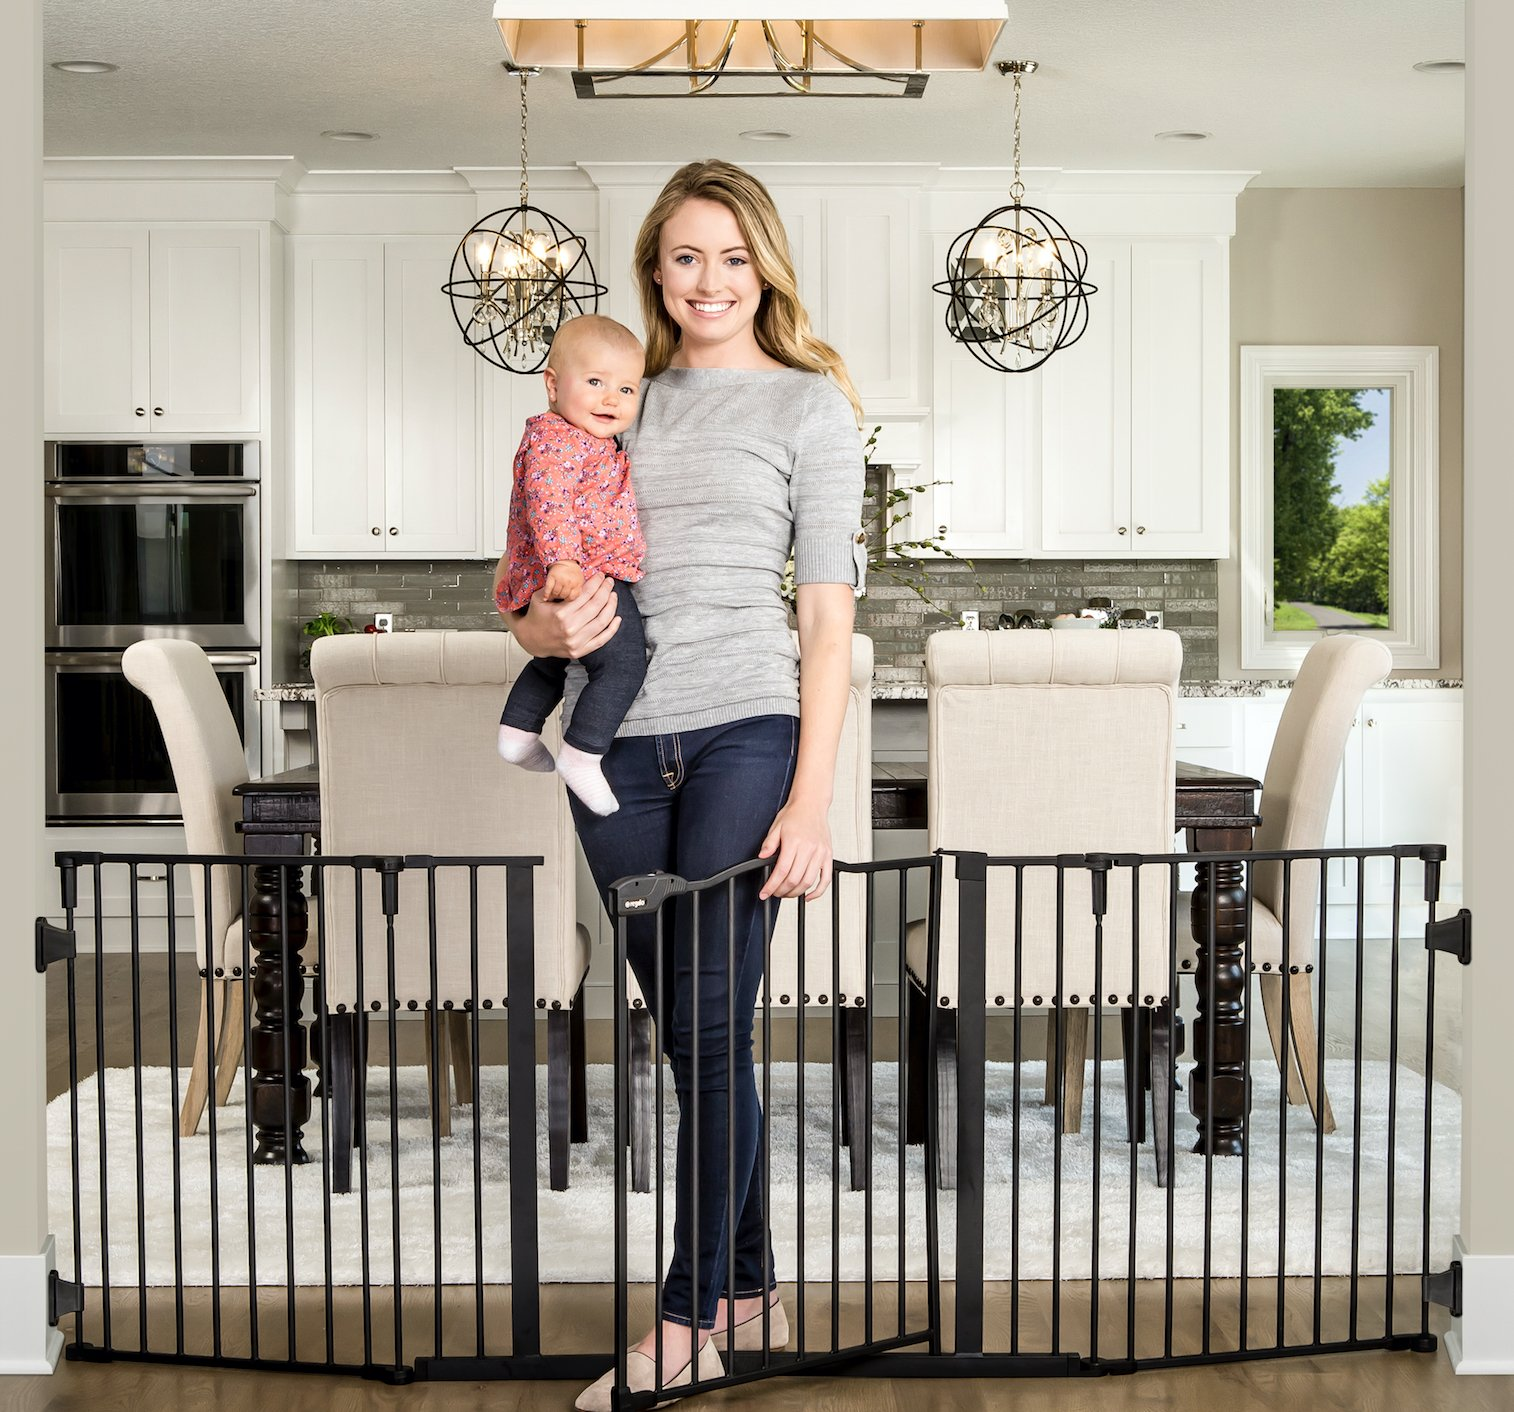 Regalo Home Decor 74-inch Wide Super Wide Adjustable Gate, Black